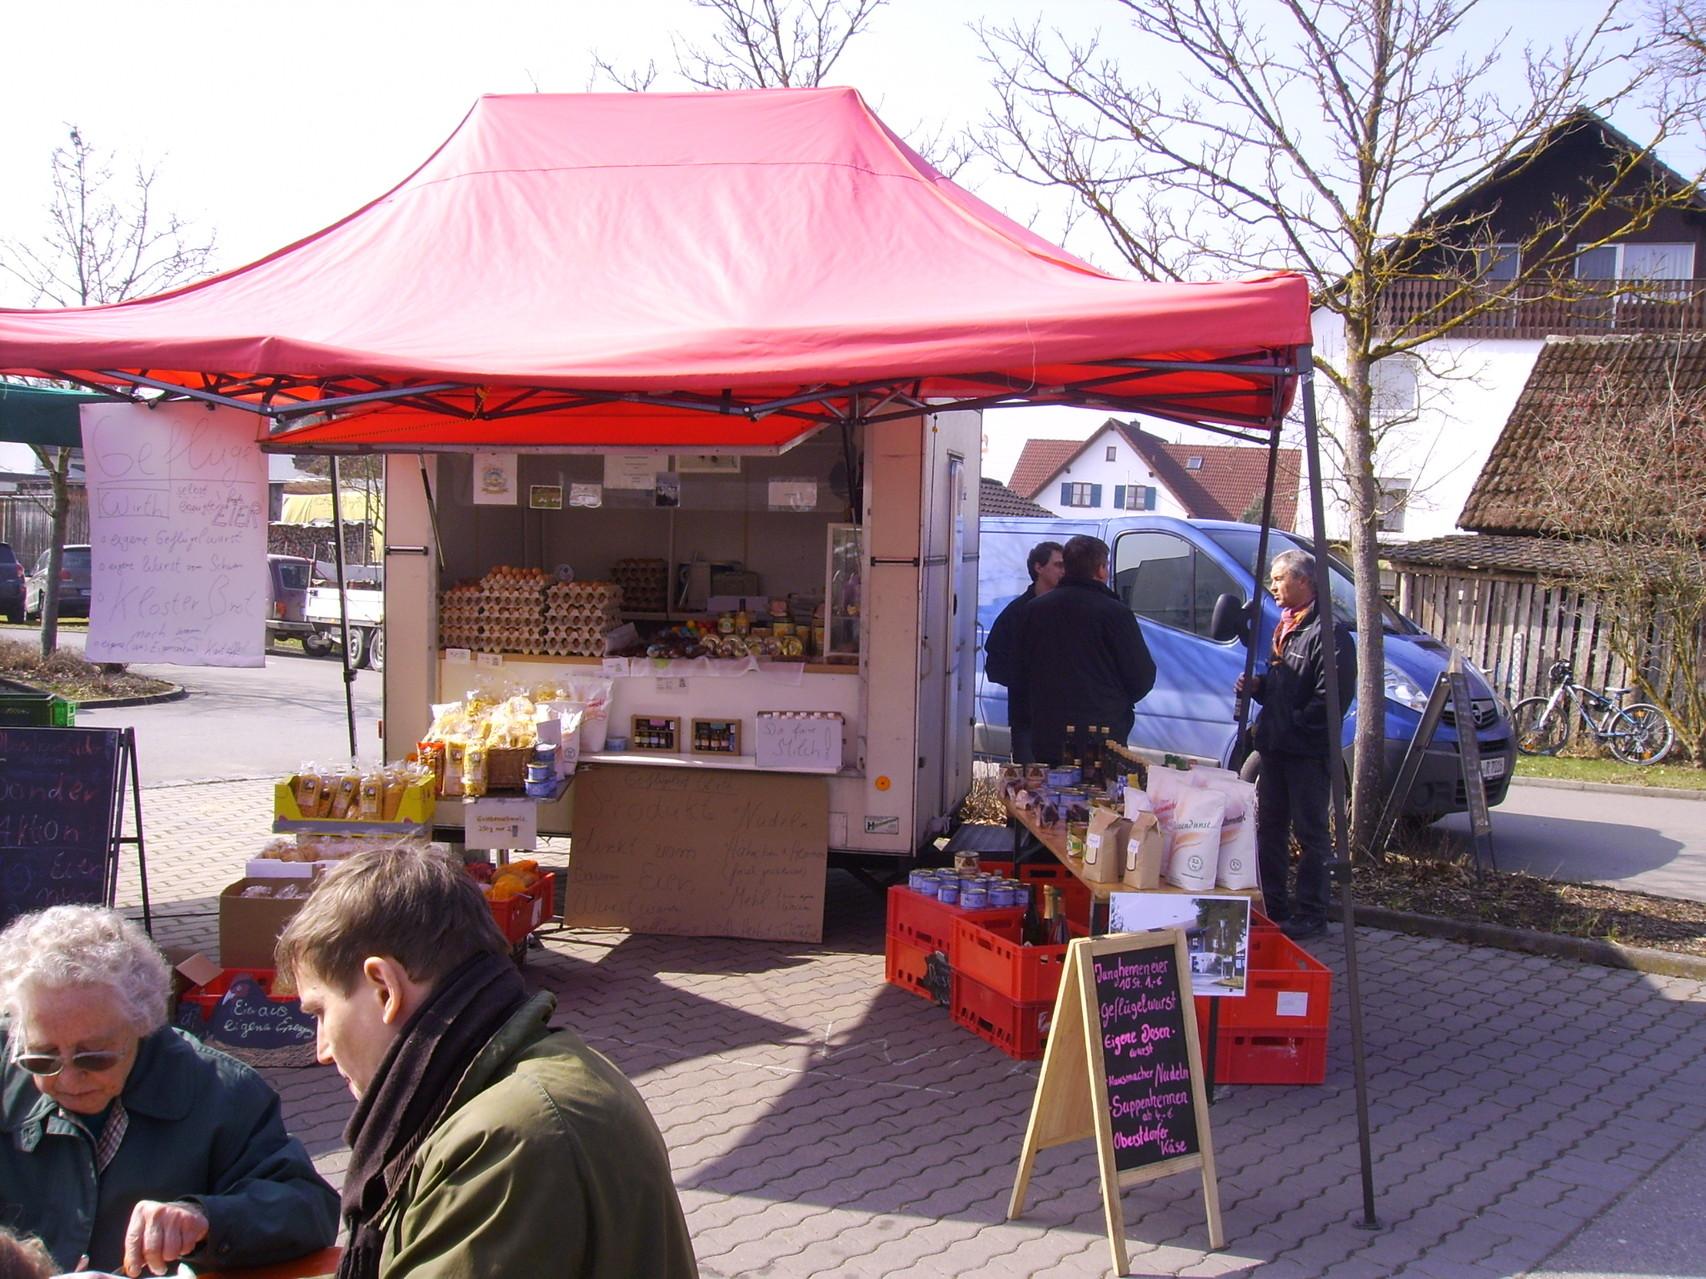 Geflügelhof Wirth mit Eiern, Nudeln, Käse u. u. u.